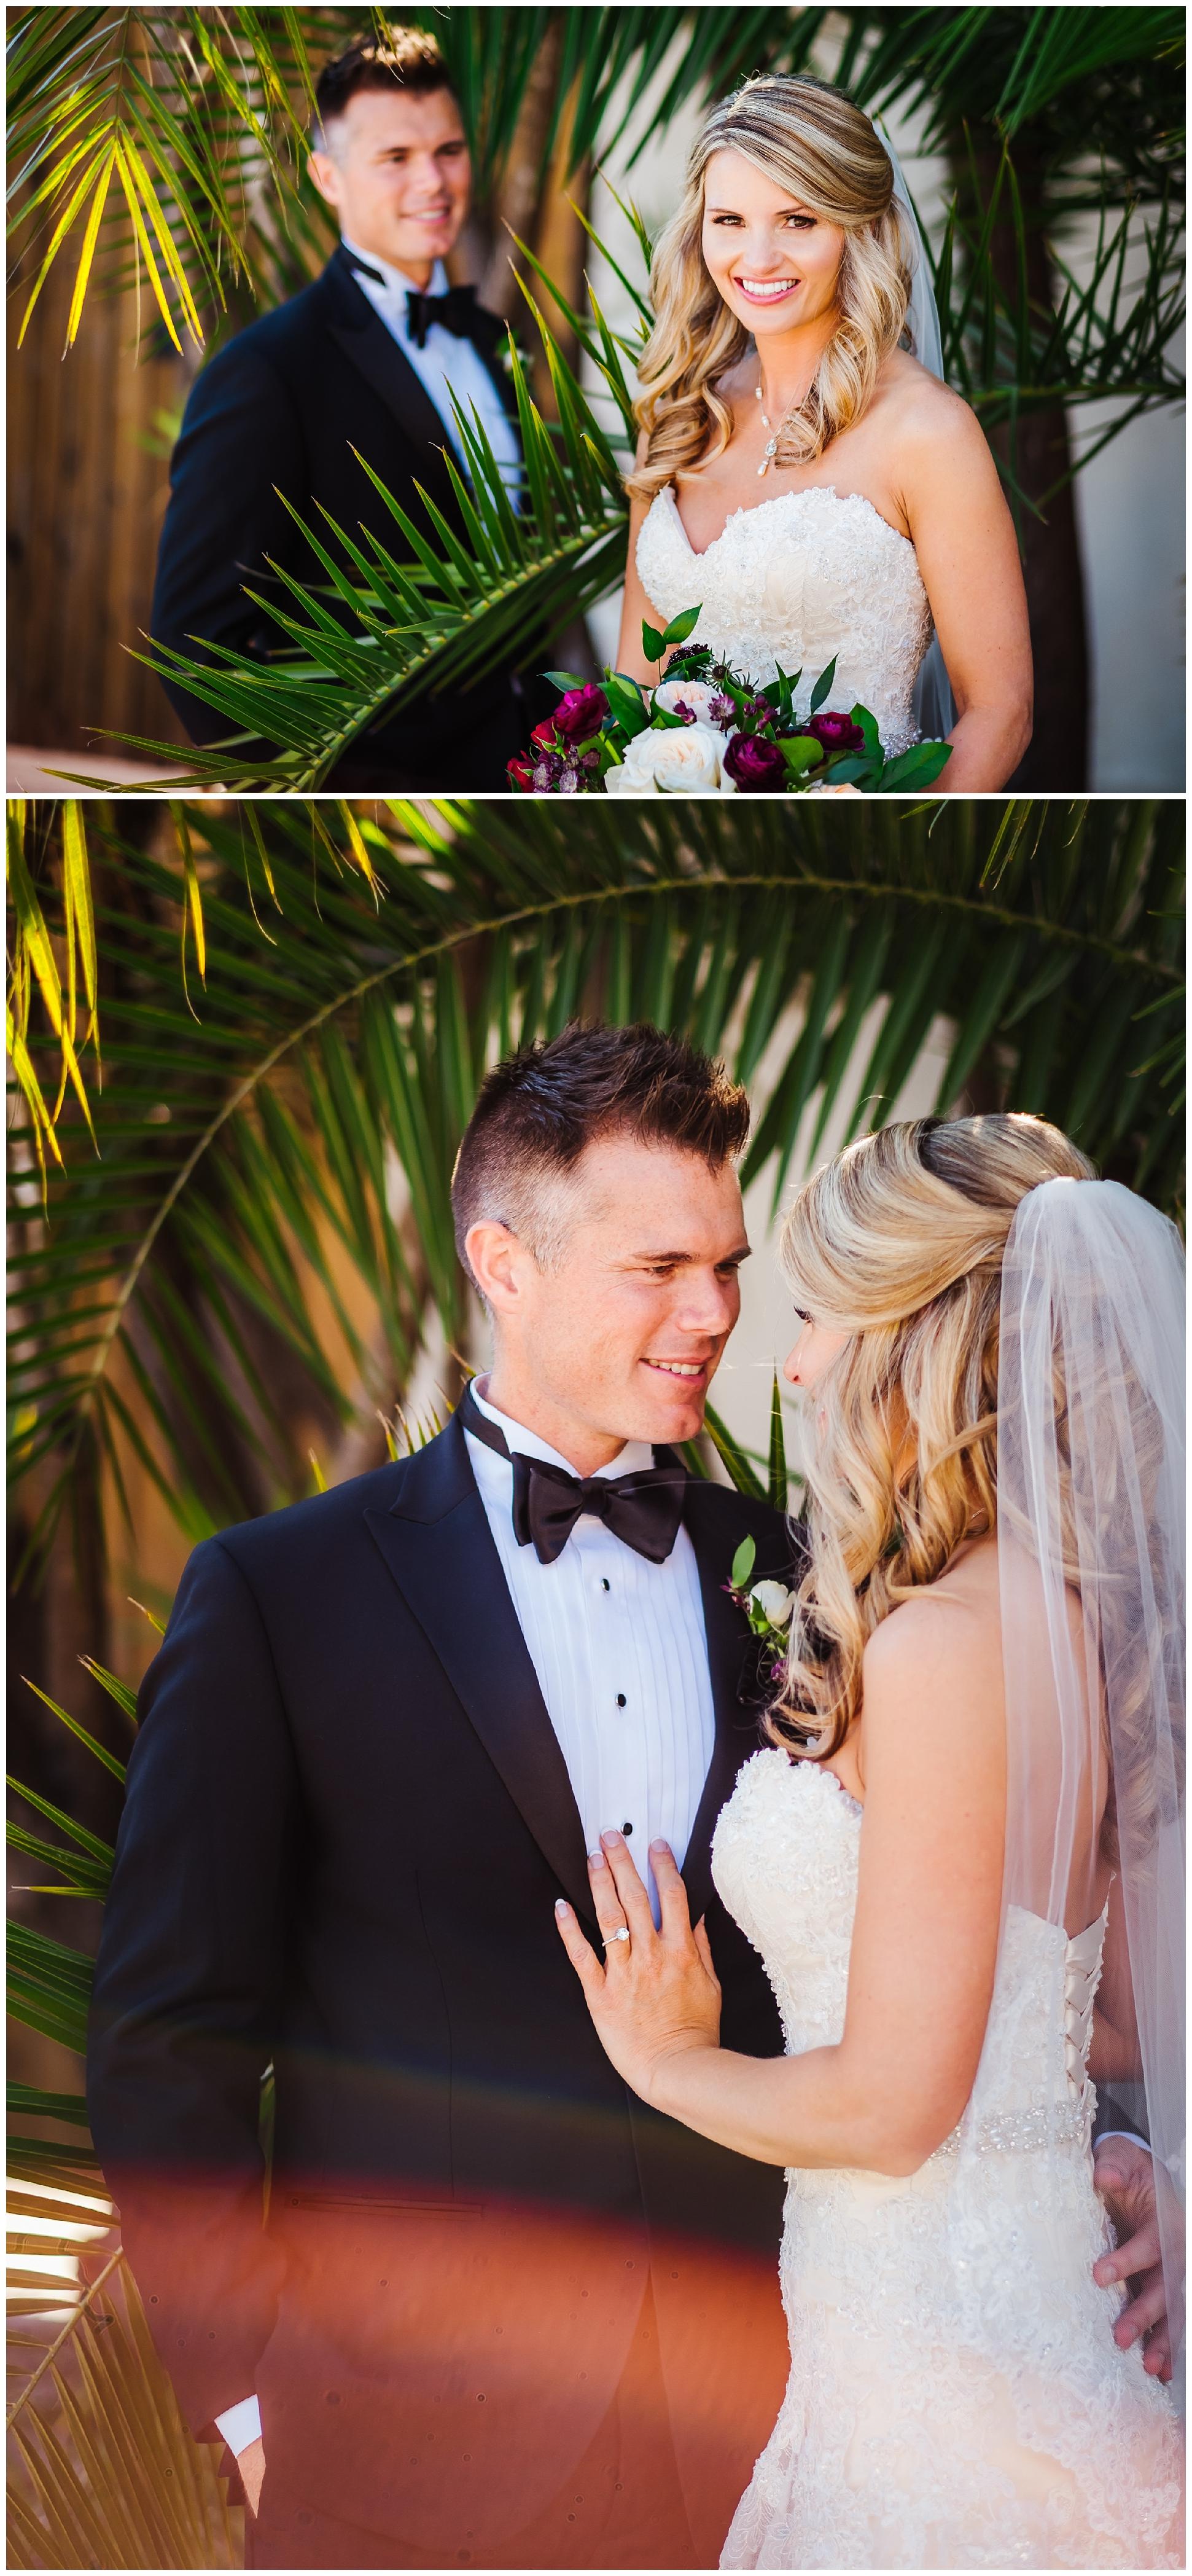 tampa-bradenton-wedding-photographer-south-florida-museum-classic-blush-gold-alpacas-sparklers_0039.jpg